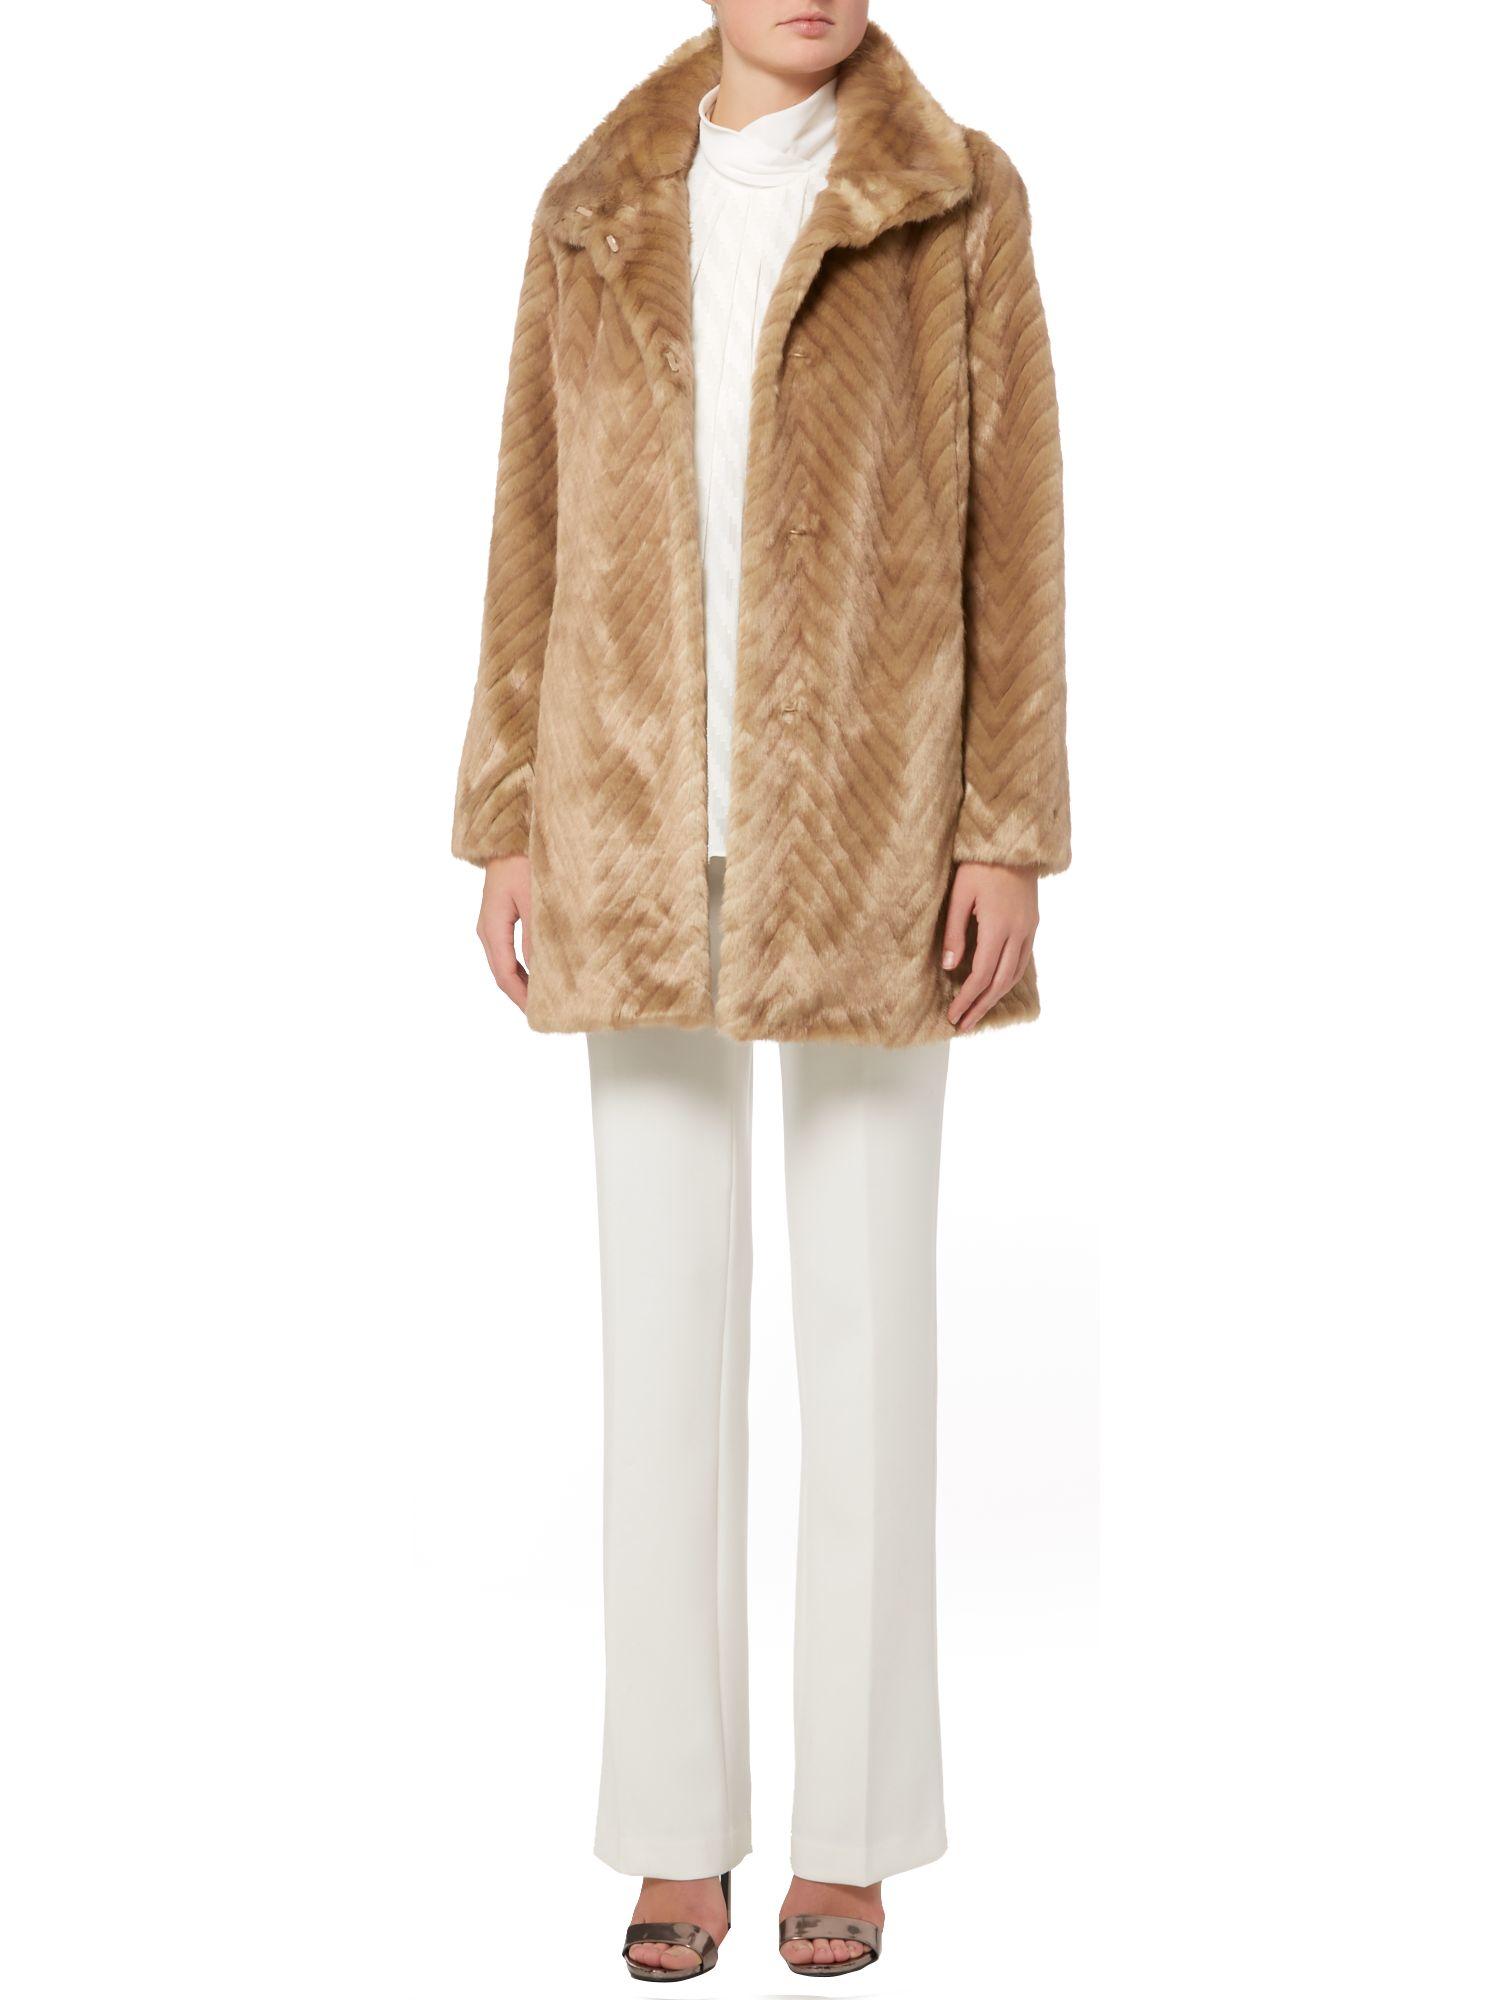 Ellen tracy Mink Faux Fur Coat in Natural | Lyst